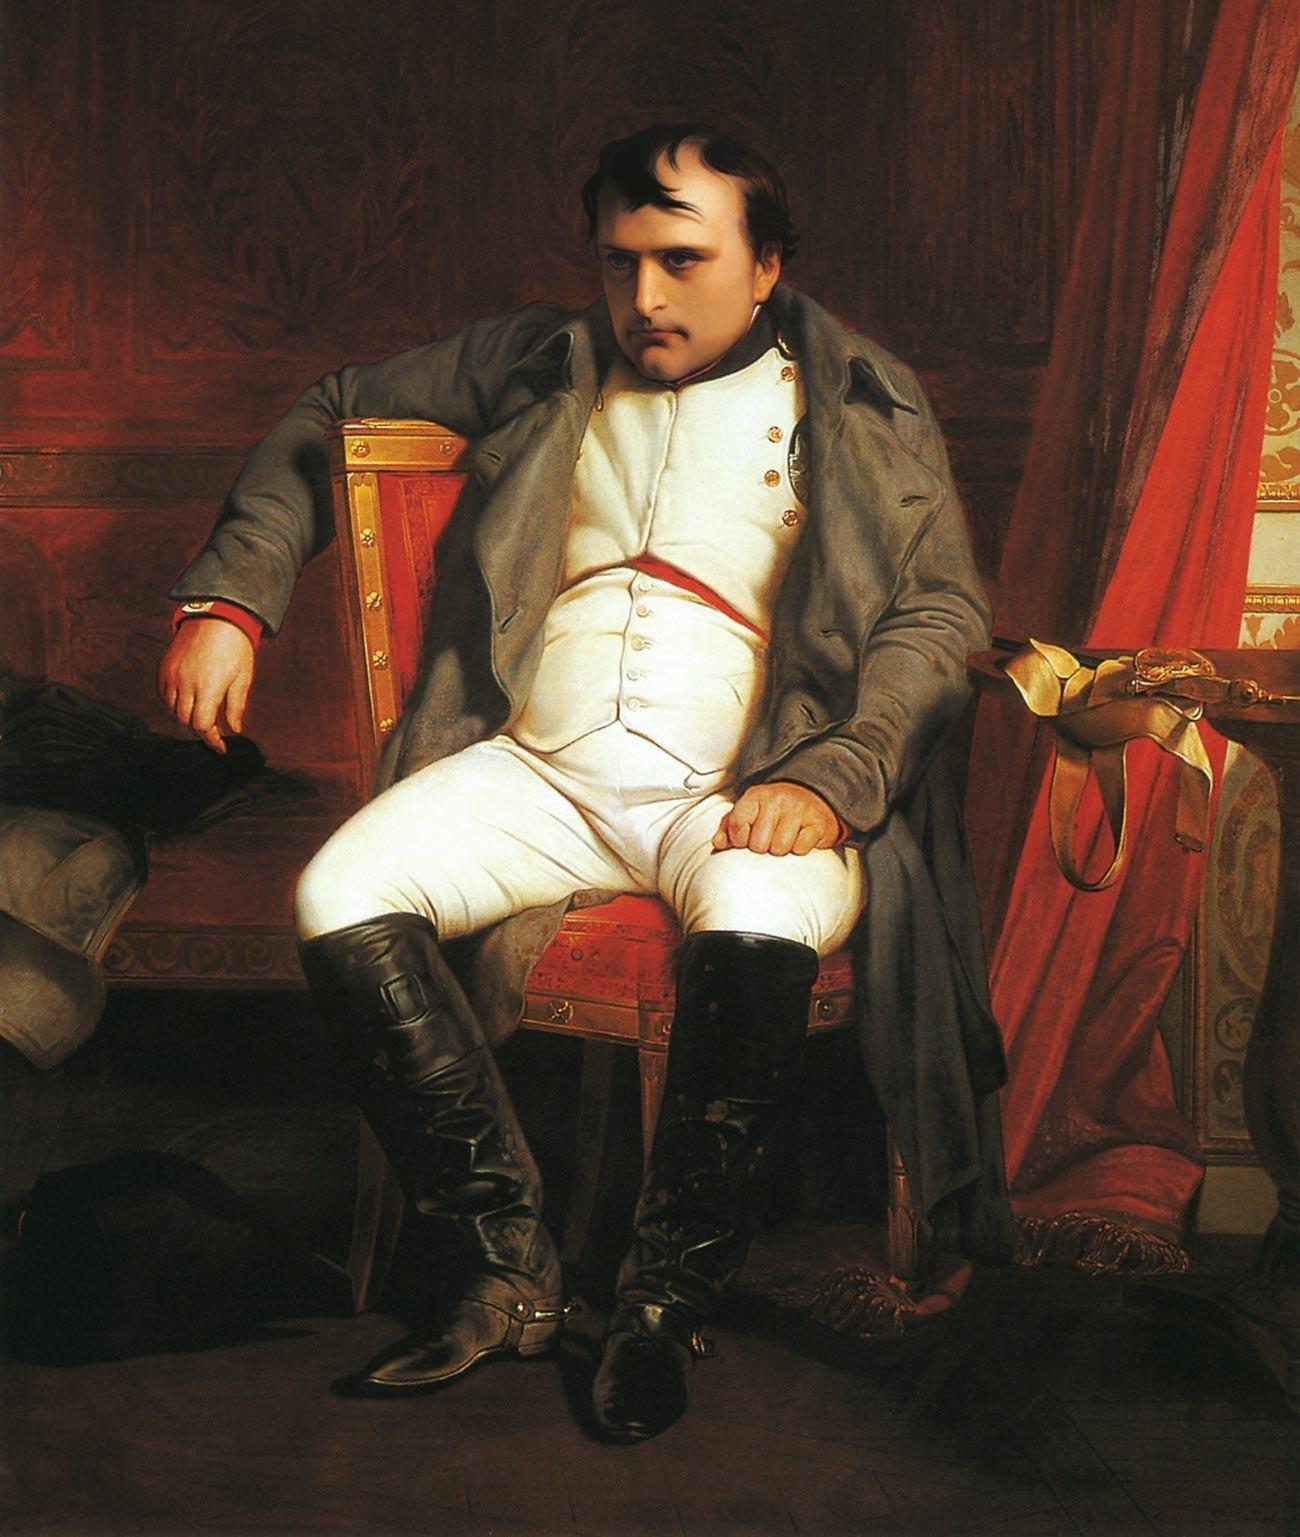 Napoleon v dvorcu Fontainbleau po sestopu z oblasti